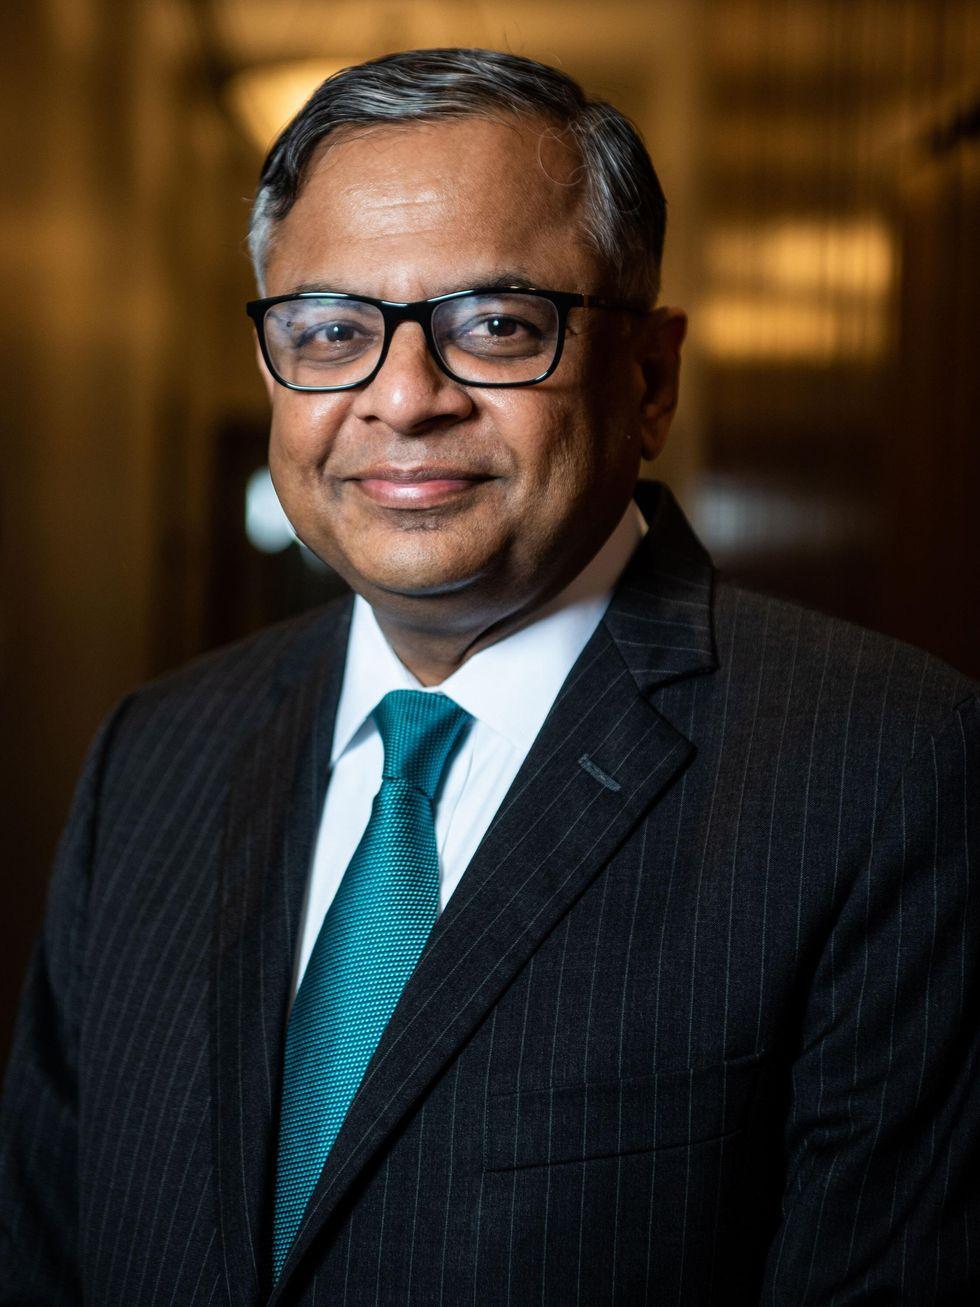 Photo of Natarajan Chandrasekaran